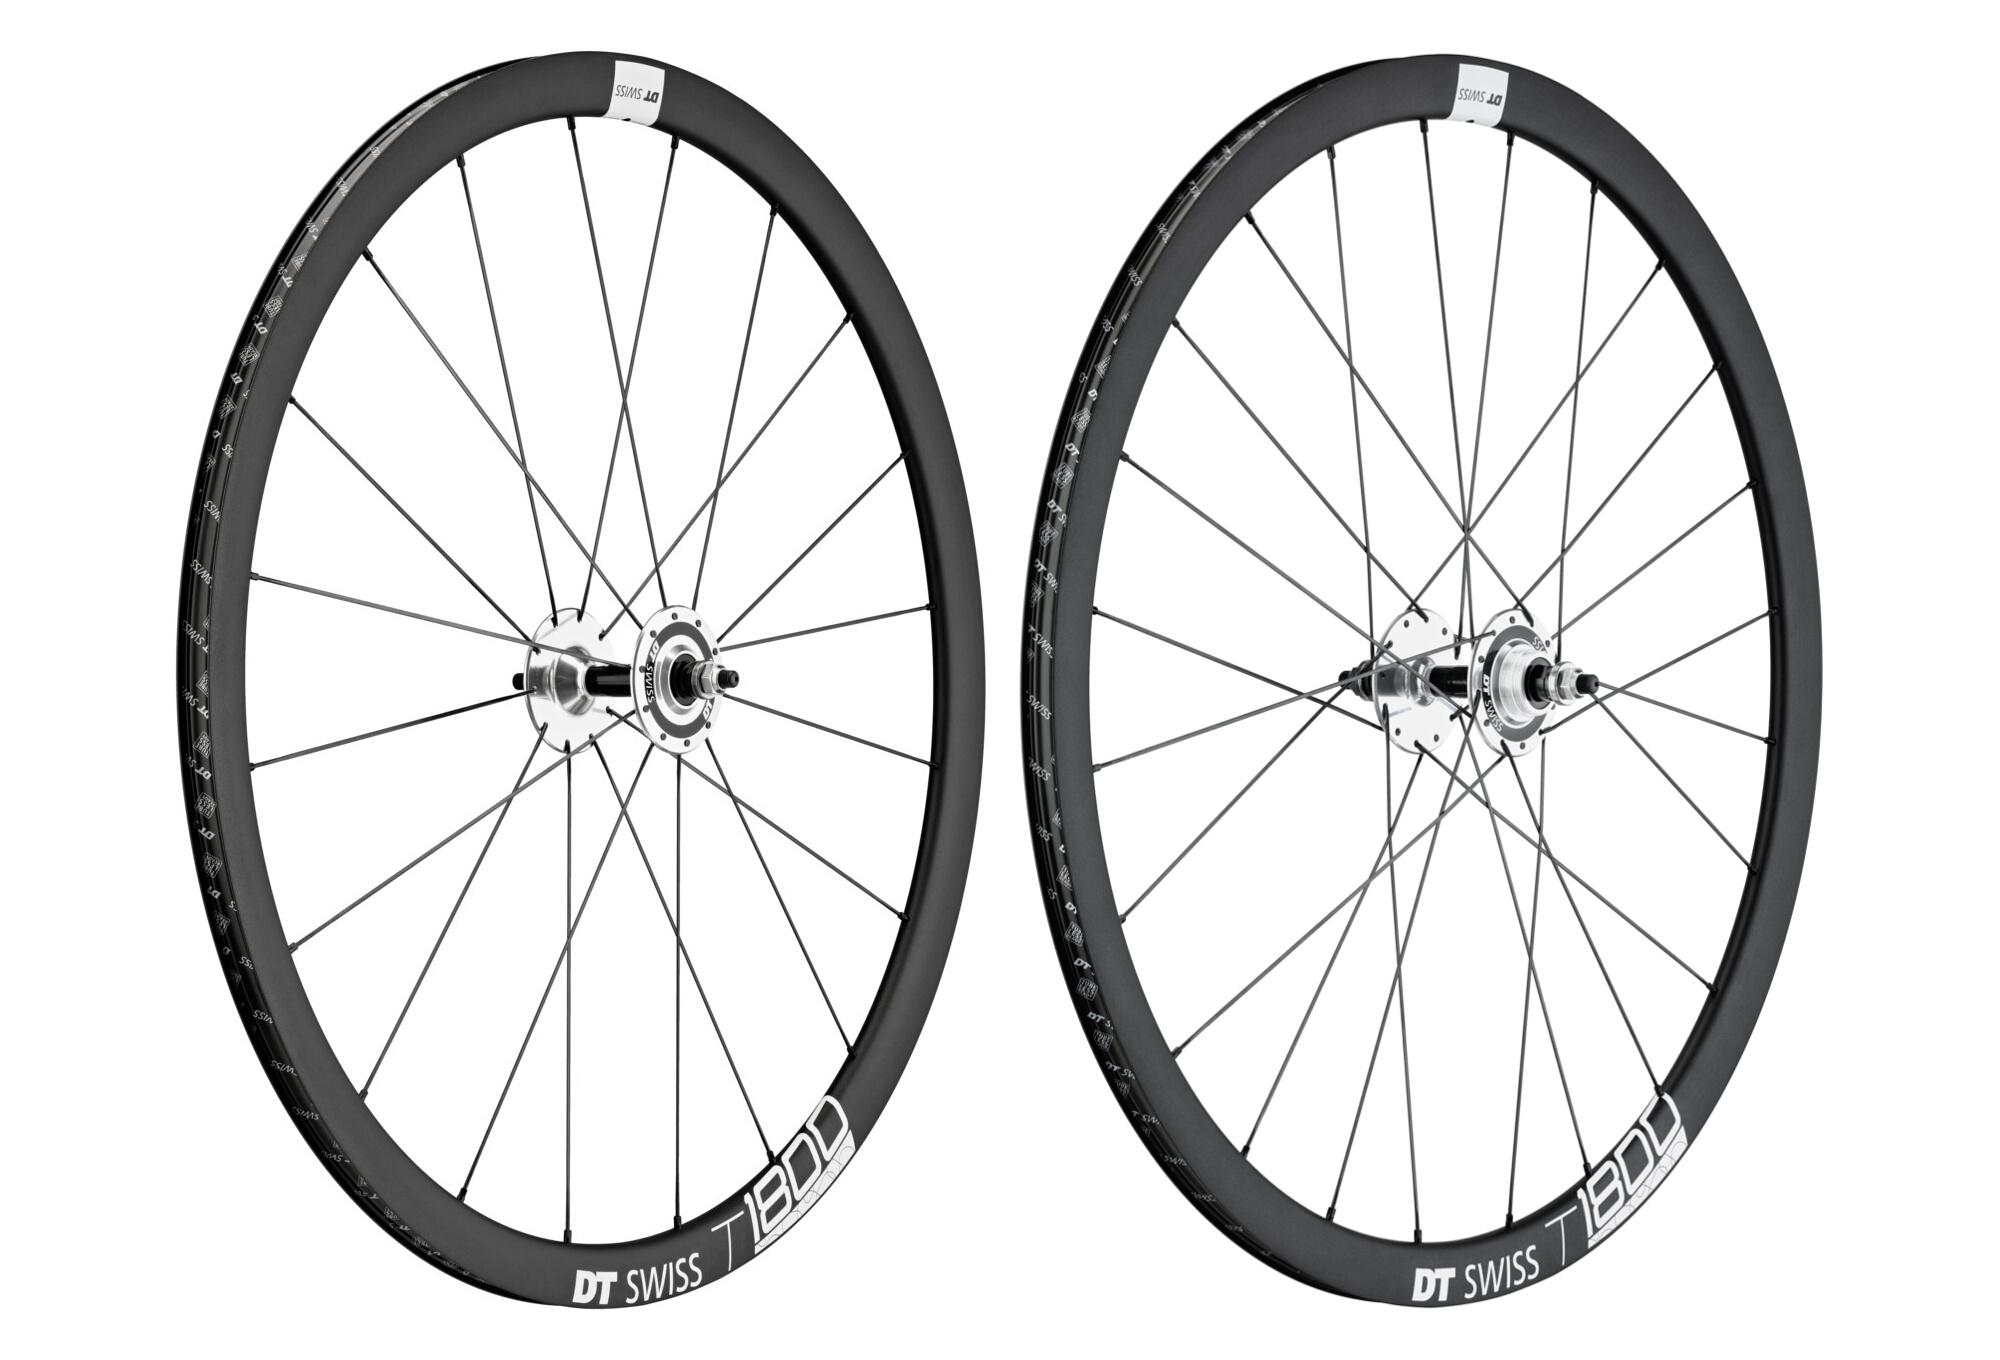 DT SWISS T1800 Classic Wheelset | 9x100/10x120mm | 2018